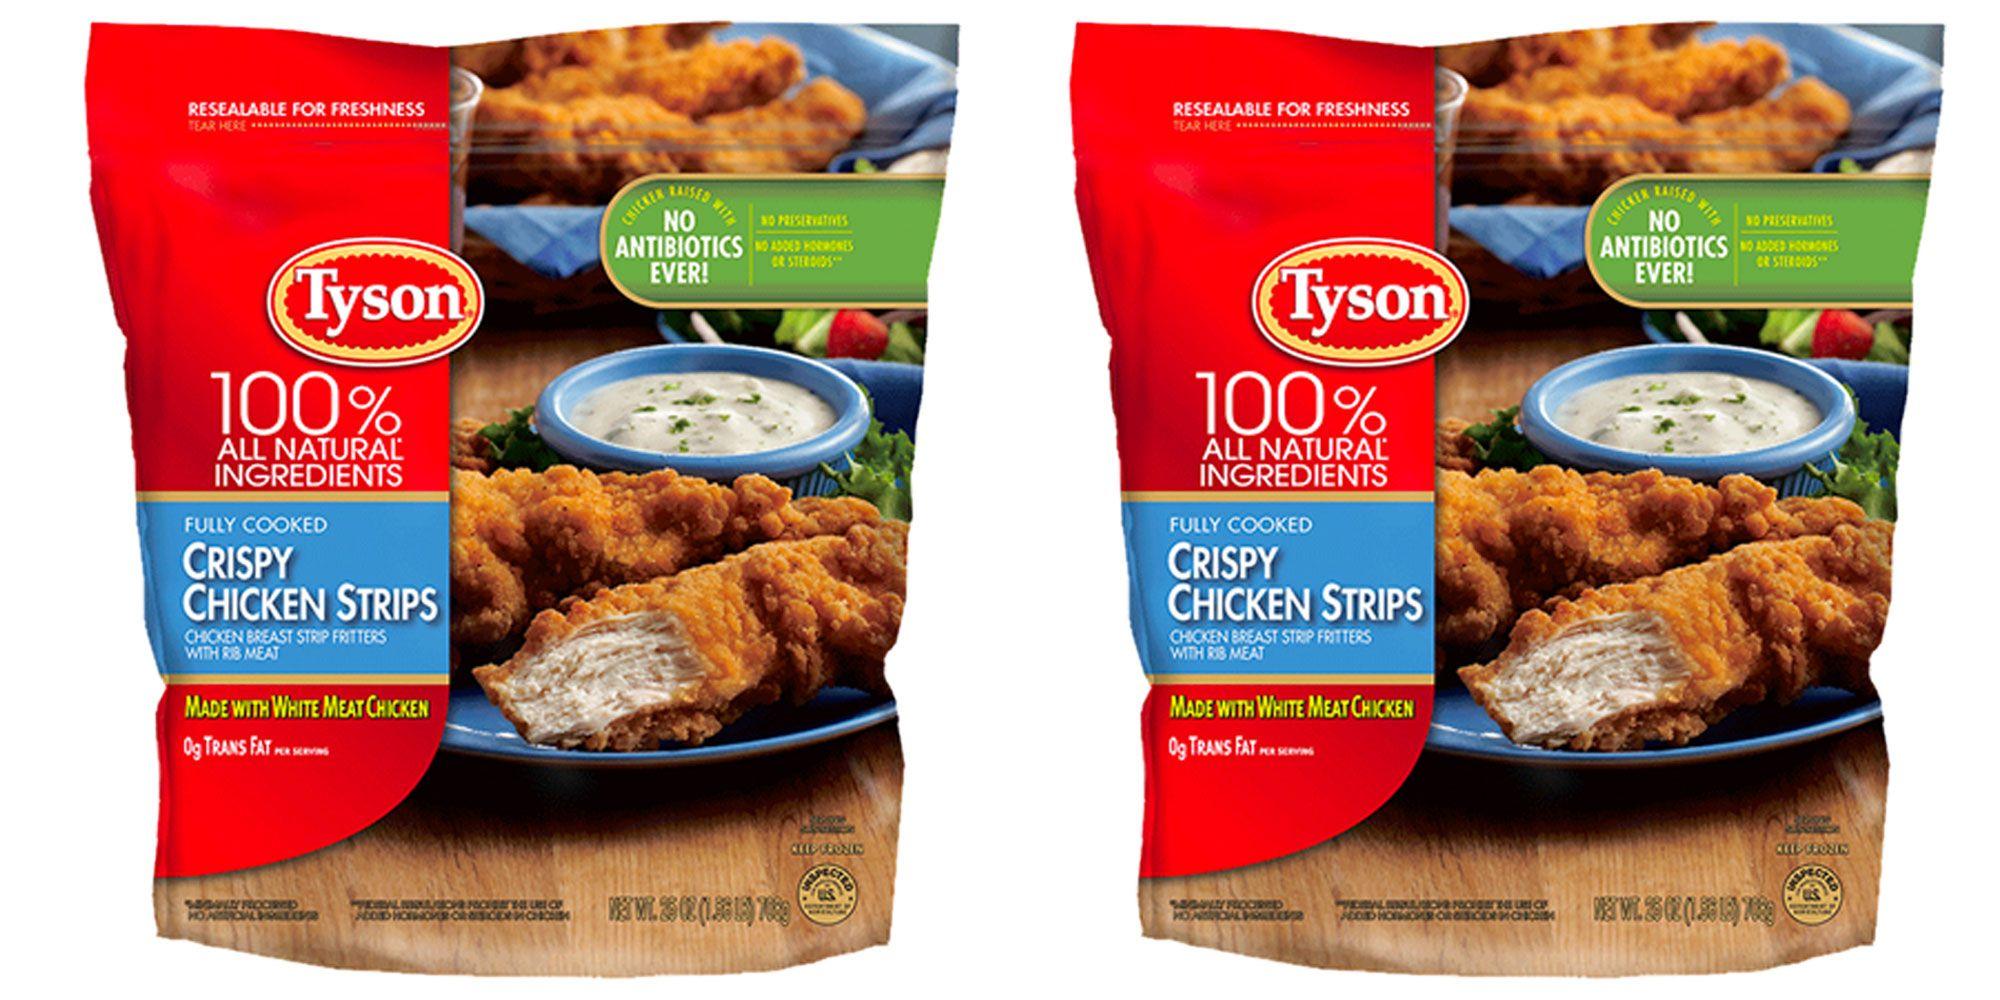 Million Pounds Of Tyson Chicken Recalled